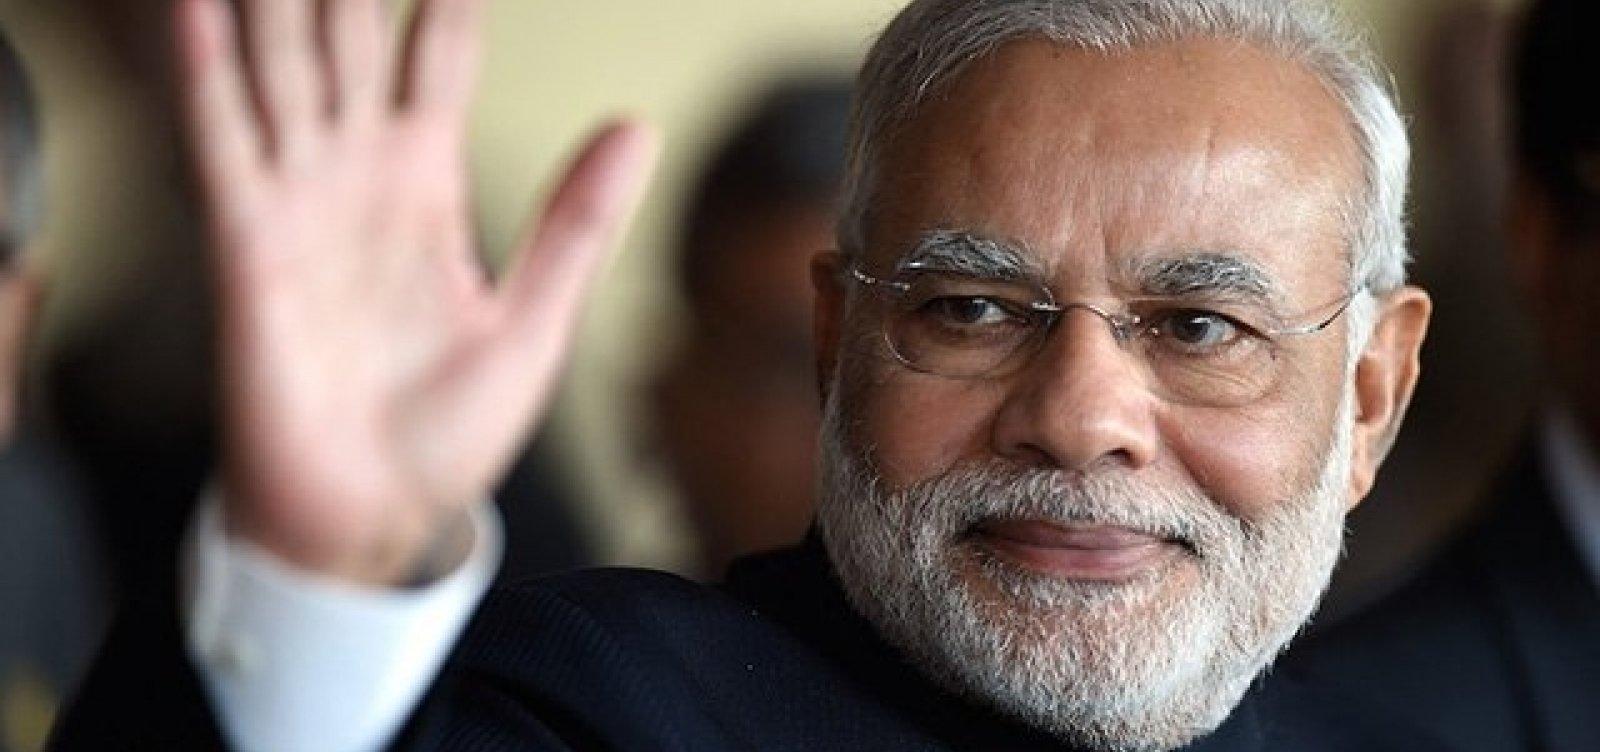 [Coronavírus: Índia decreta quarentena total por 21 dias]